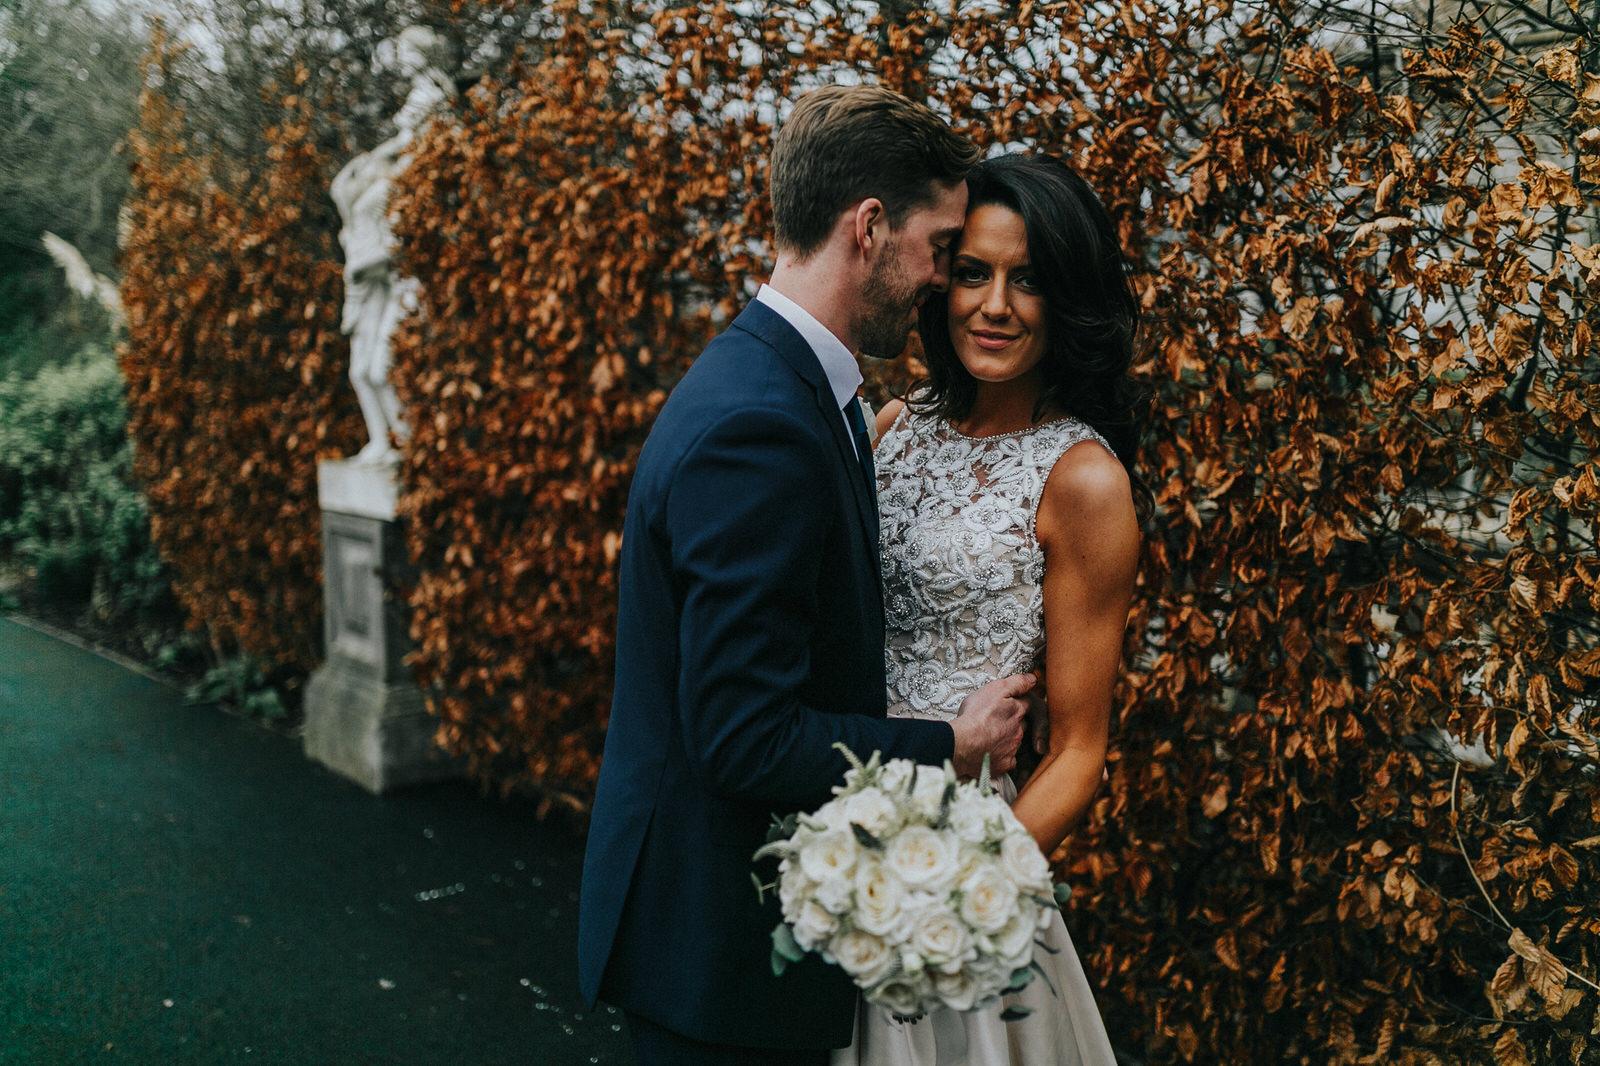 Roger_Kenny_wedding_photographer_460.jpg